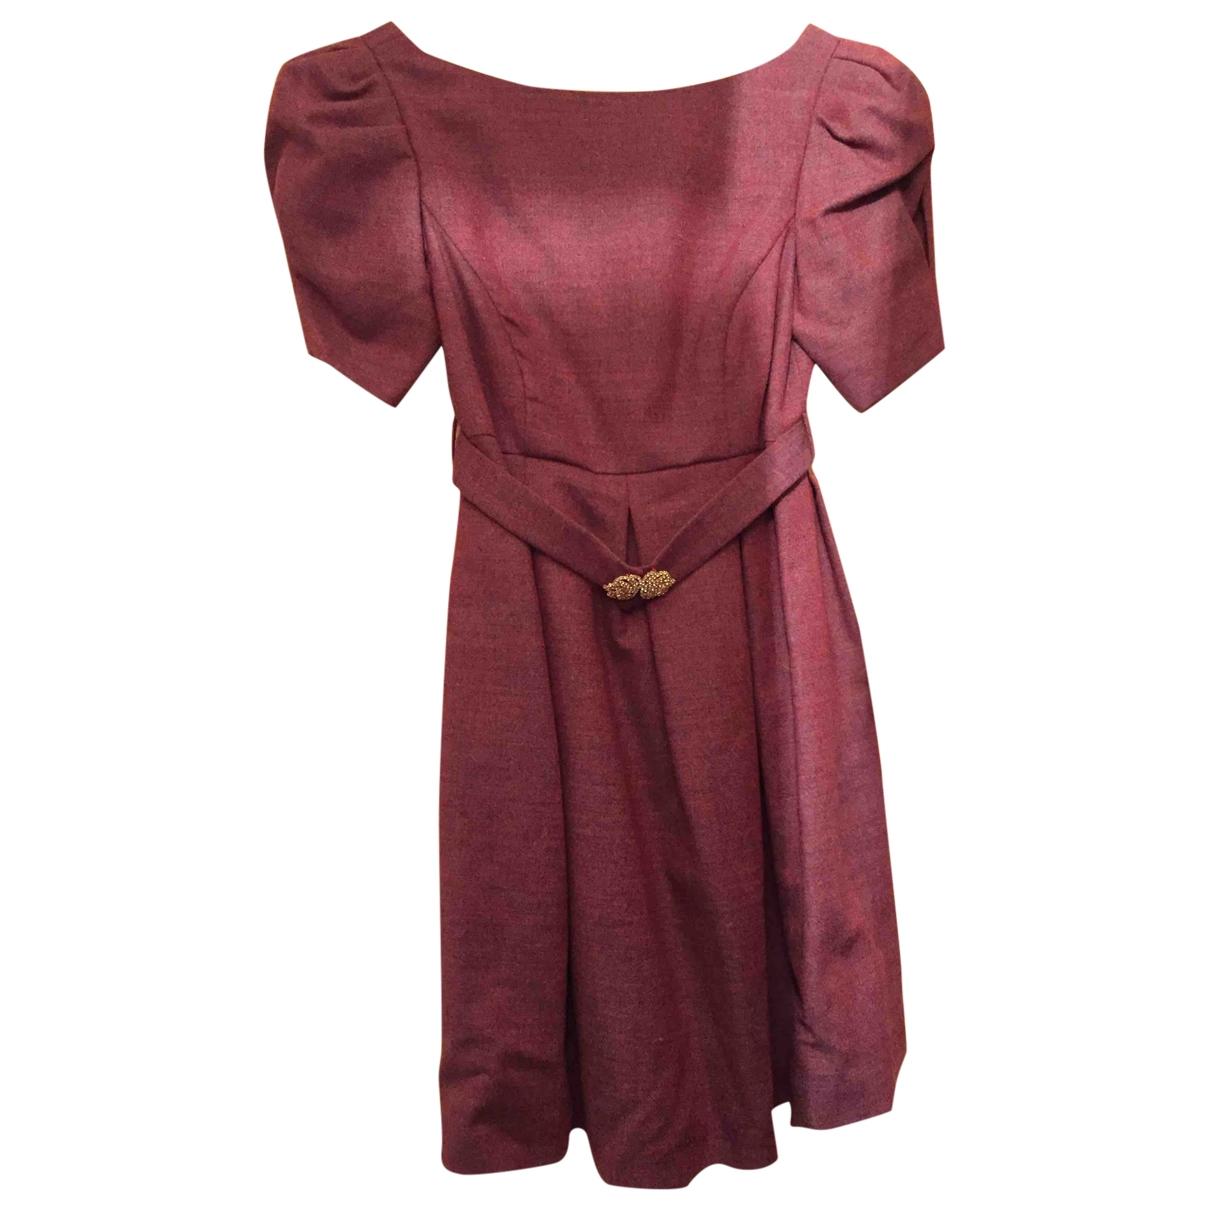 Miu Miu \N Burgundy Wool dress for Women 36 FR